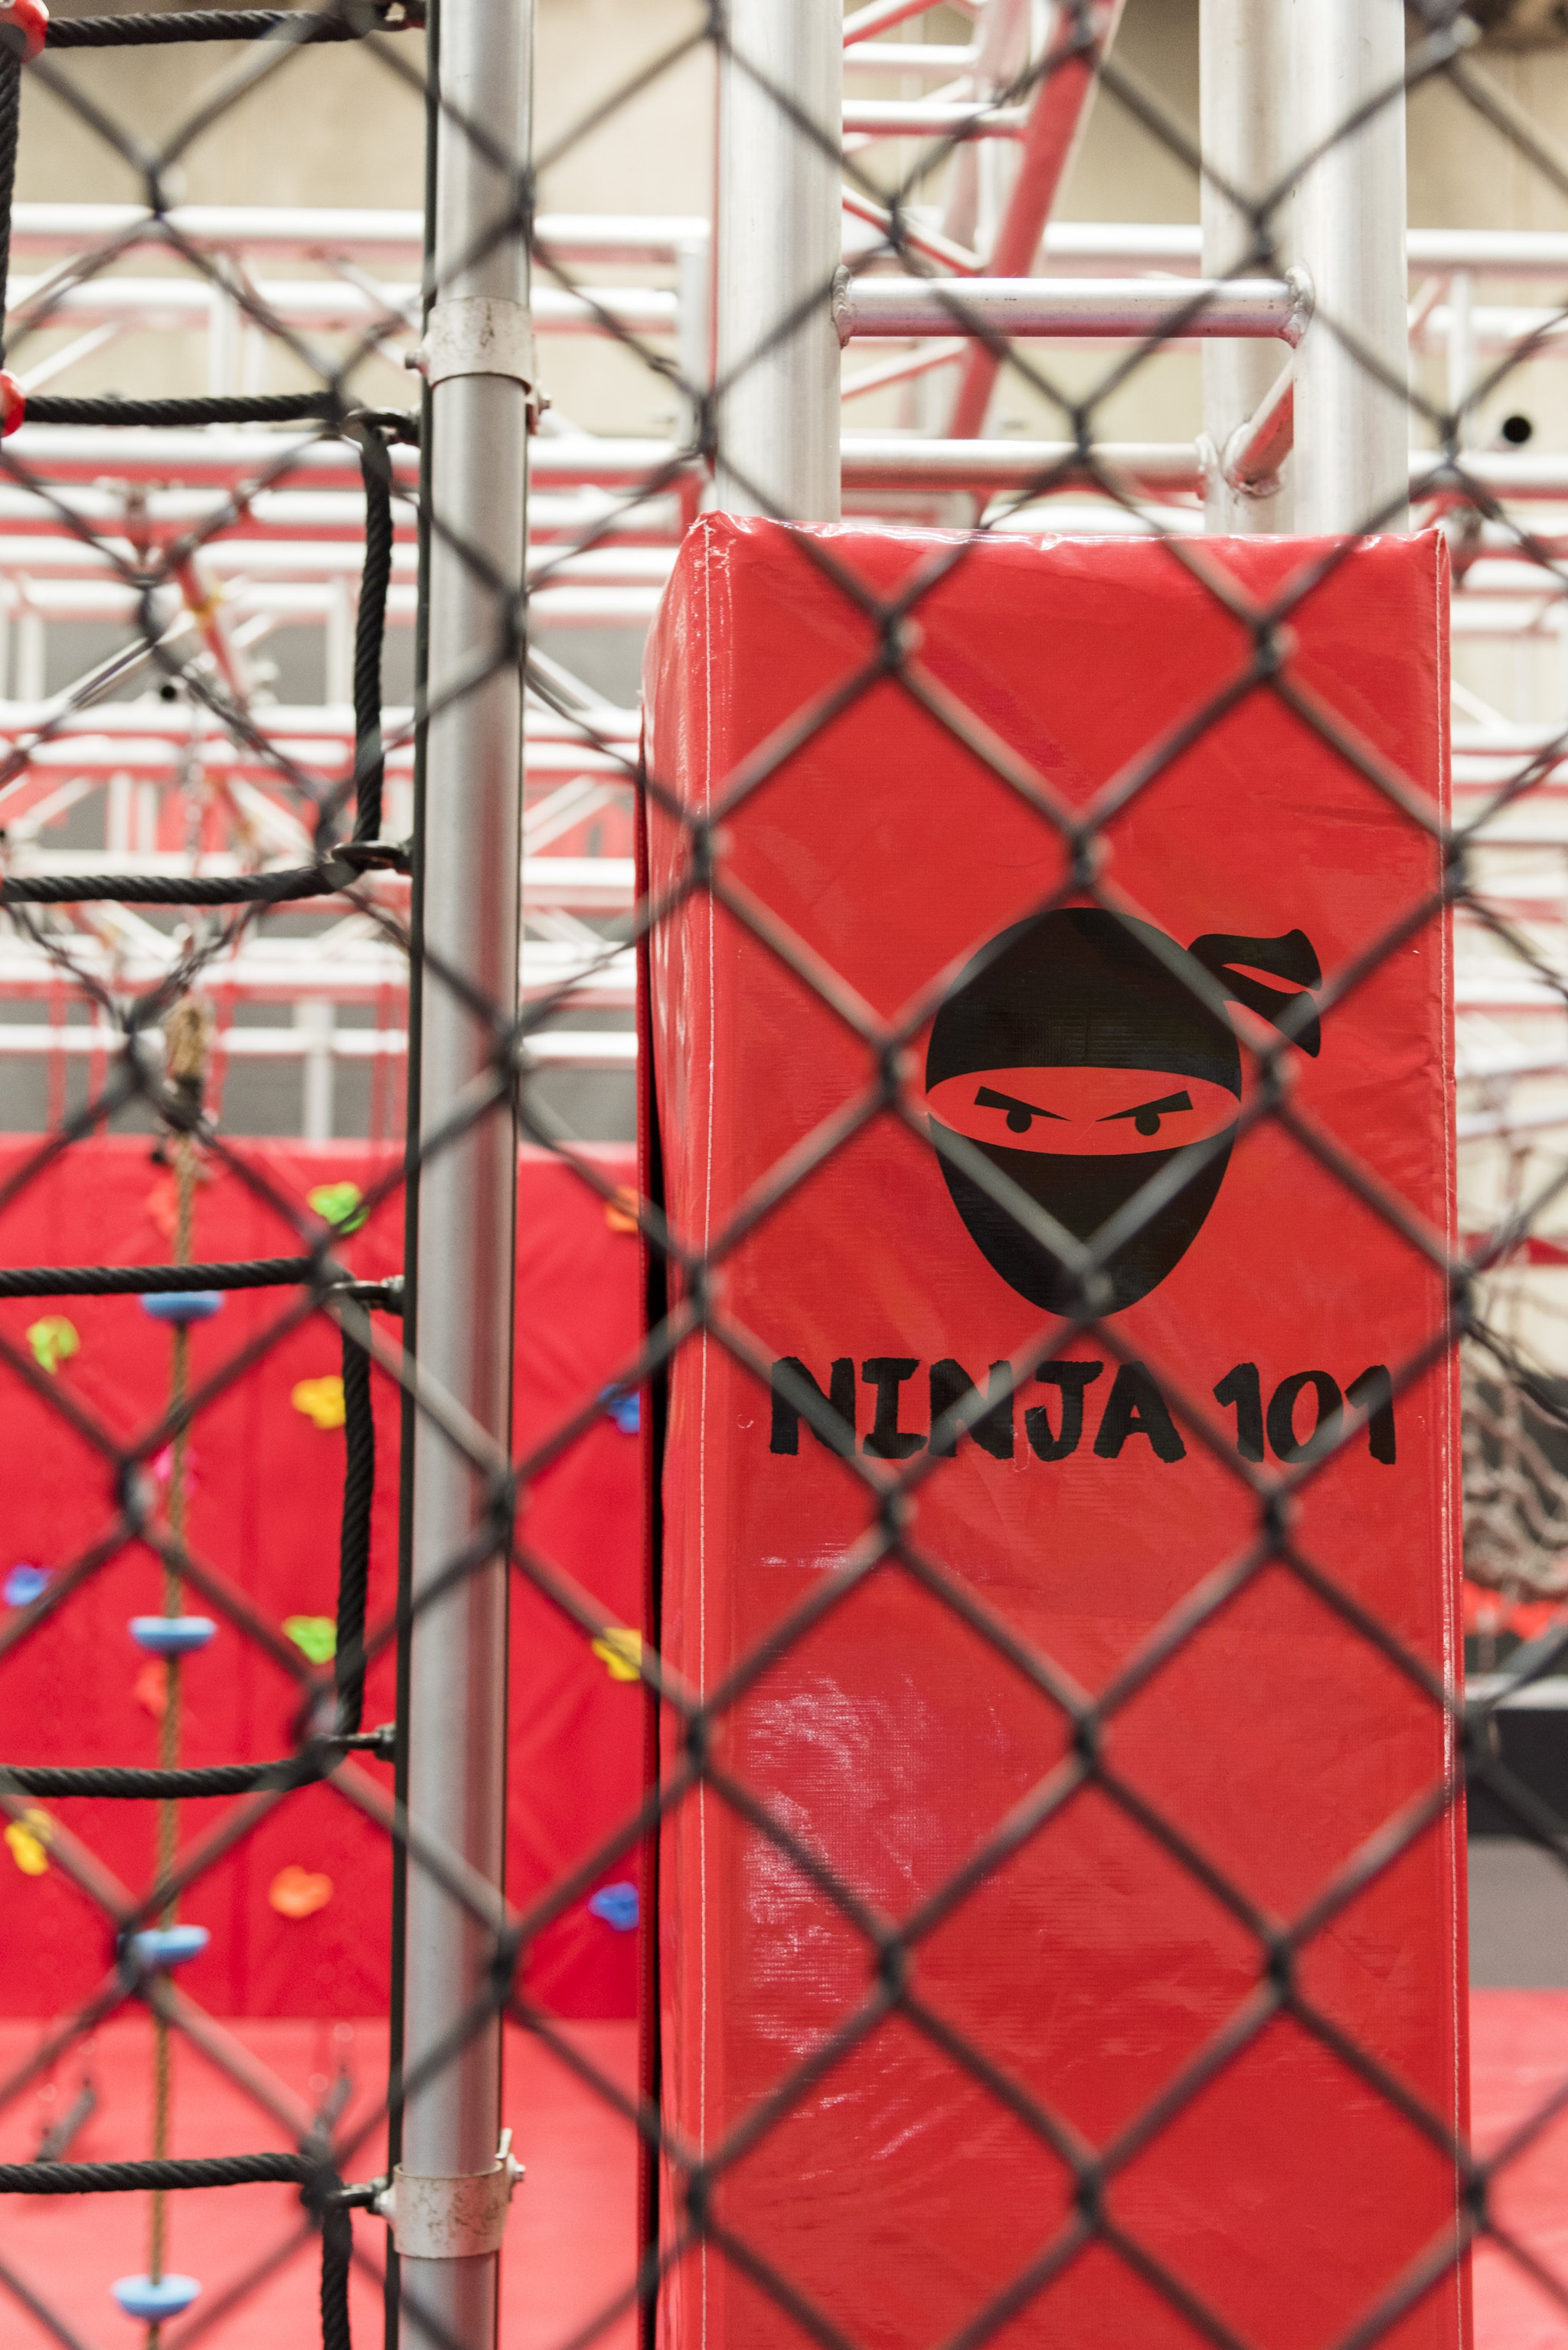 ninja-101-franchise-7